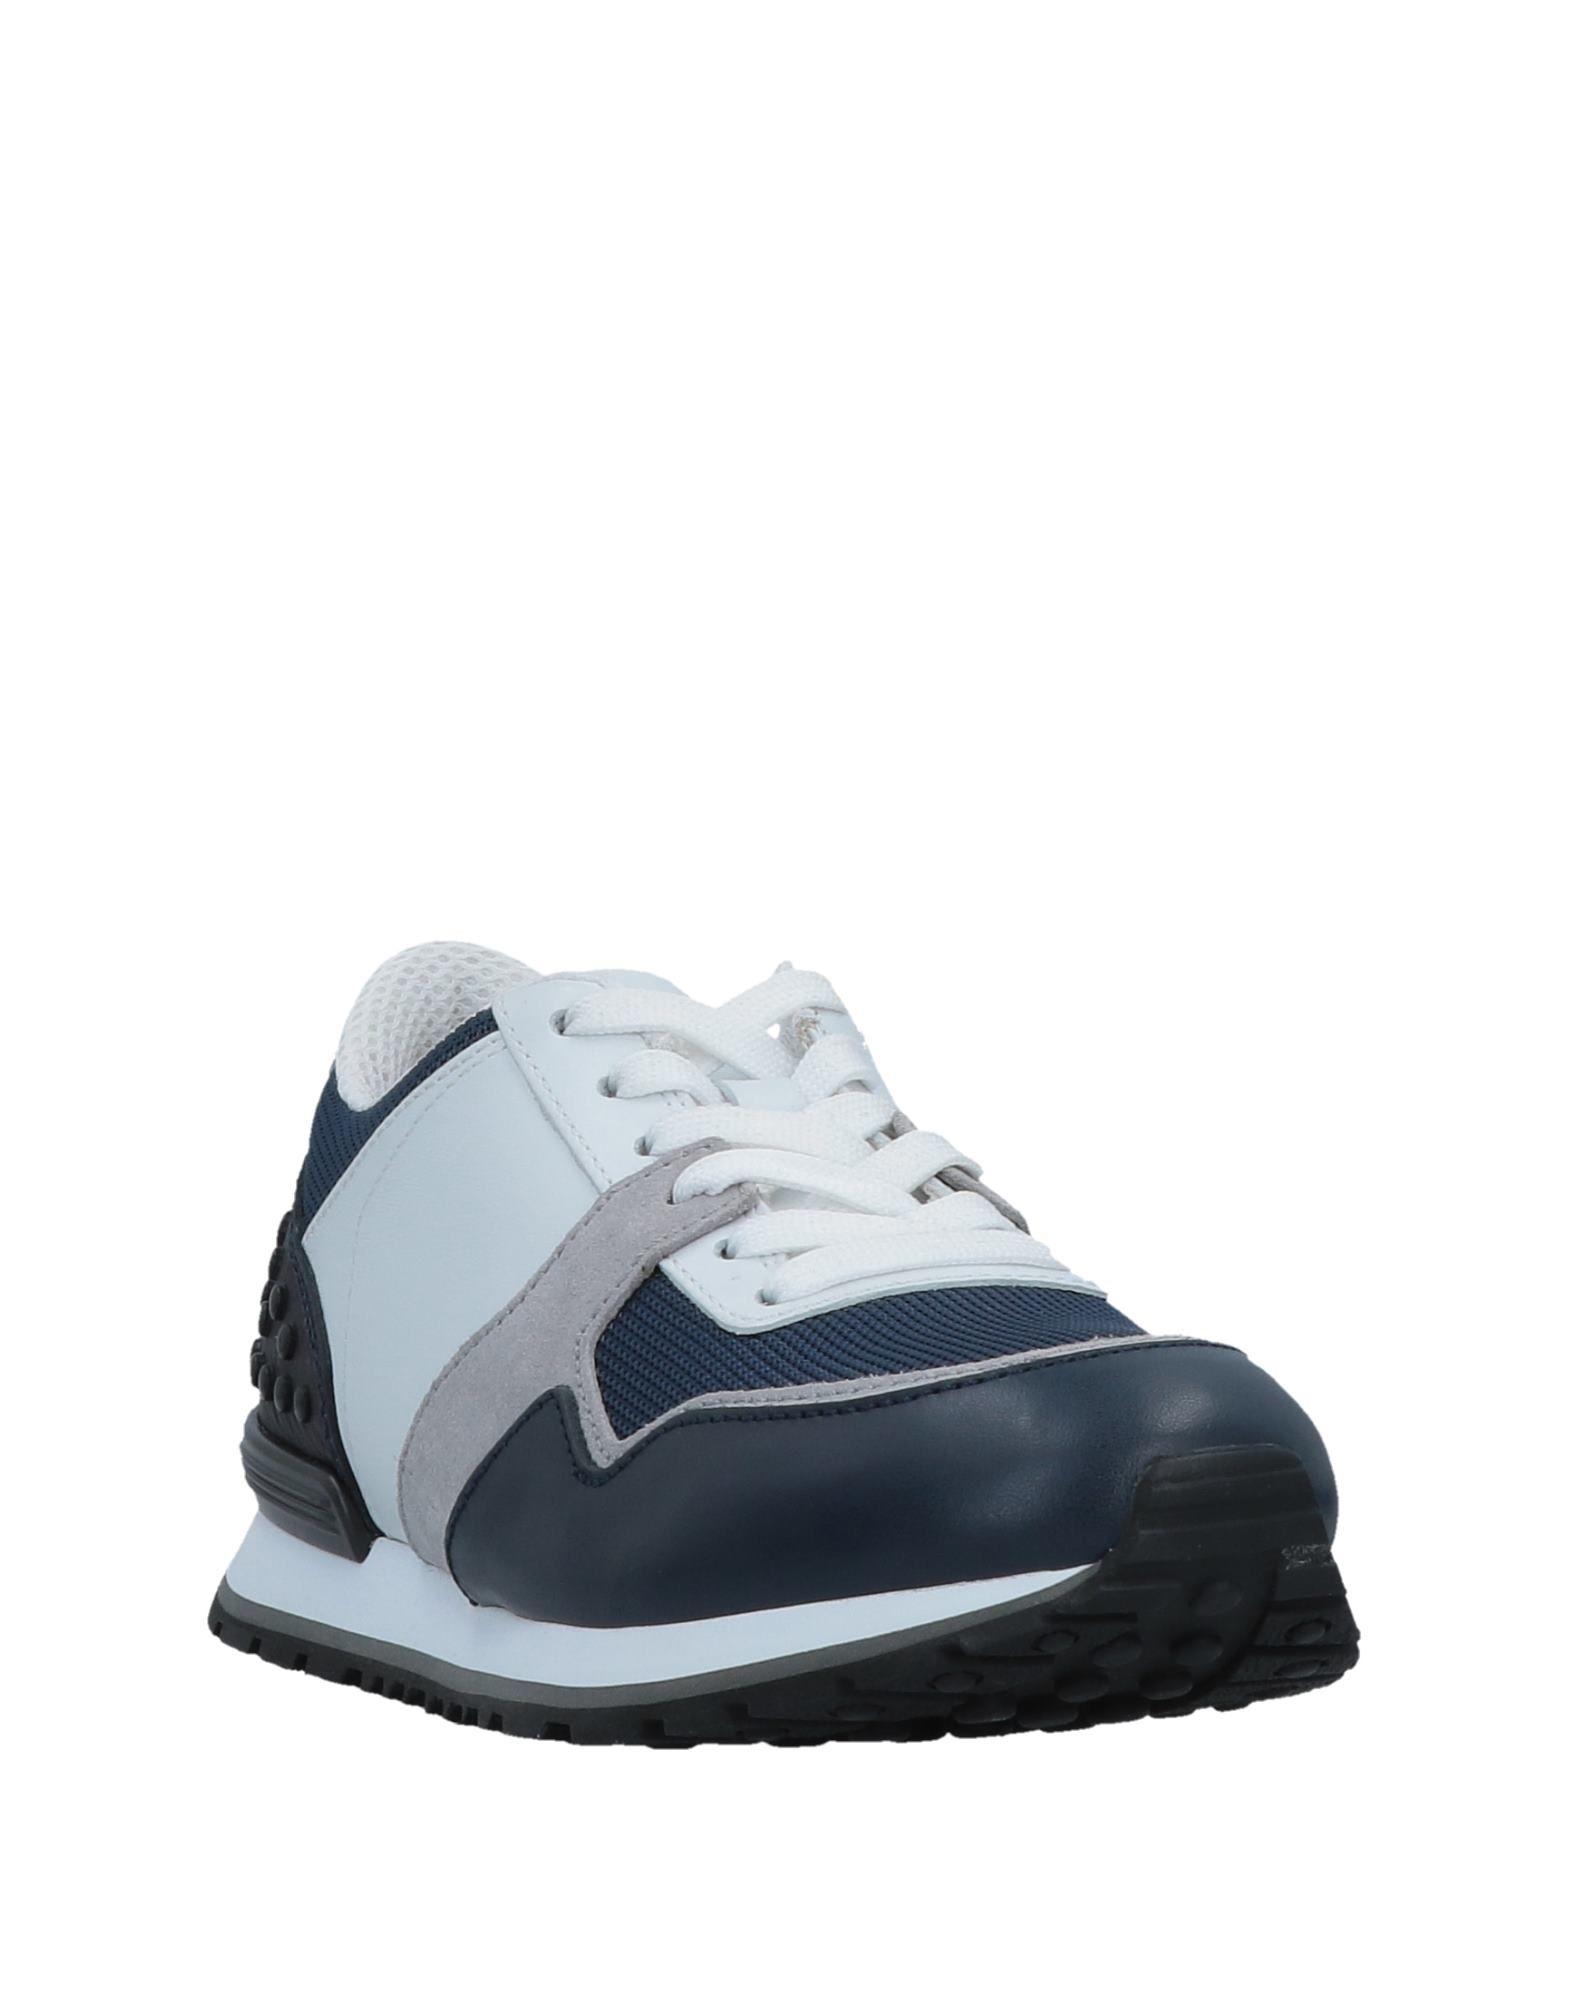 Tod's Sneakers Herren  beliebte 11507215UP Gute Qualität beliebte  Schuhe f82fc0